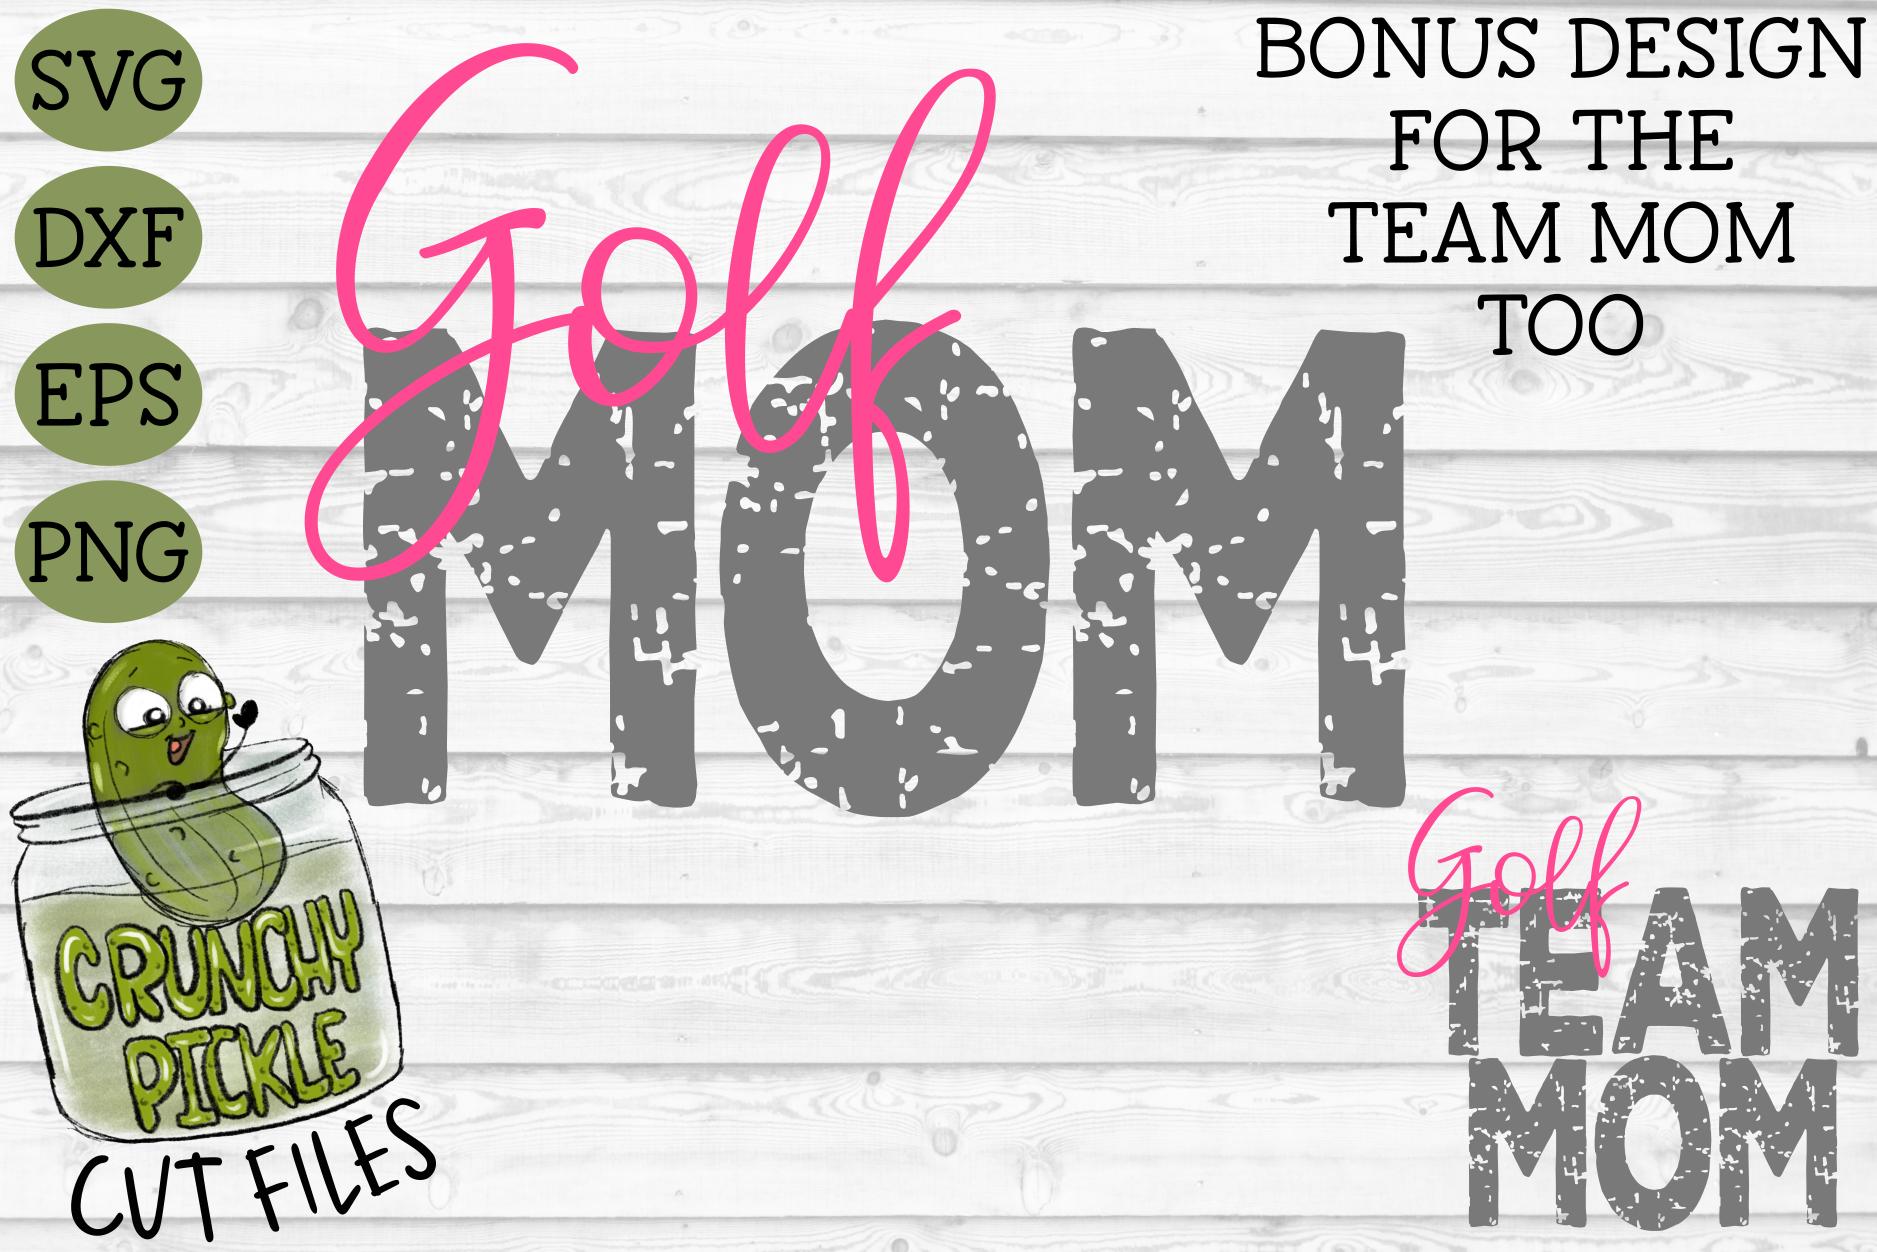 Golf Mom & Bonus Team Mom Sports SVG Cut File example image 2